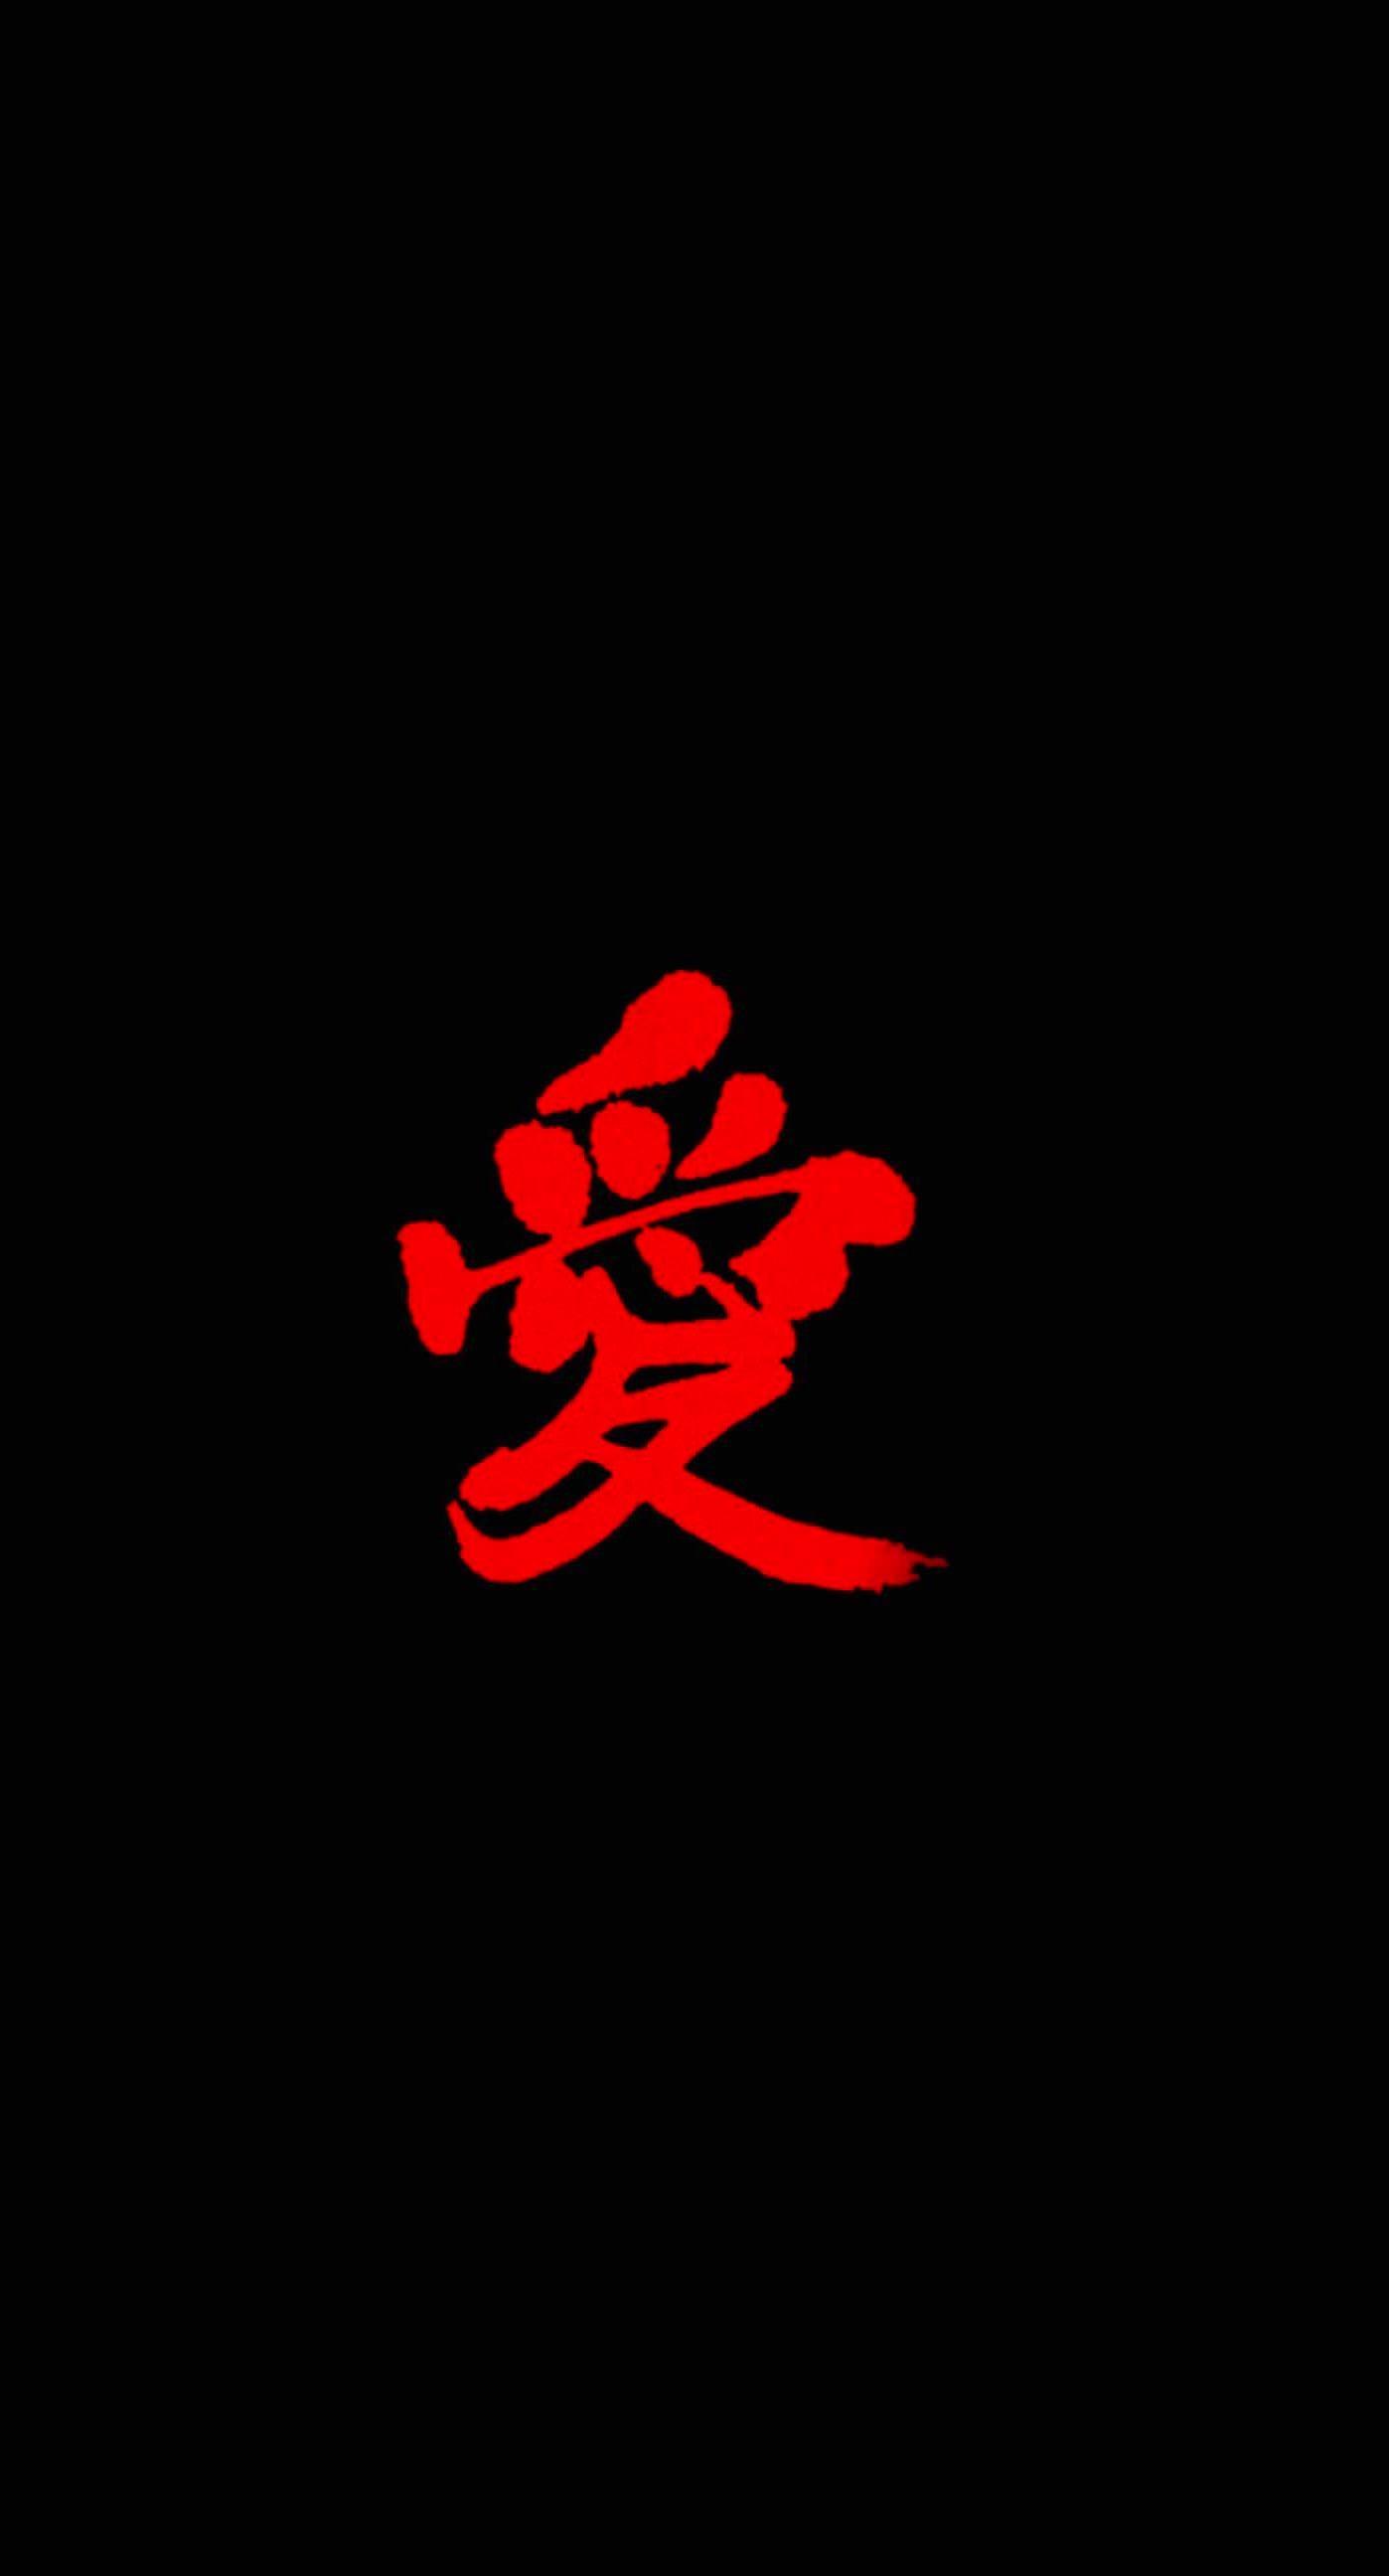 1080x1920 Lightsaber Red Starwars Art Film IPhone 6 Plus Wallpaper